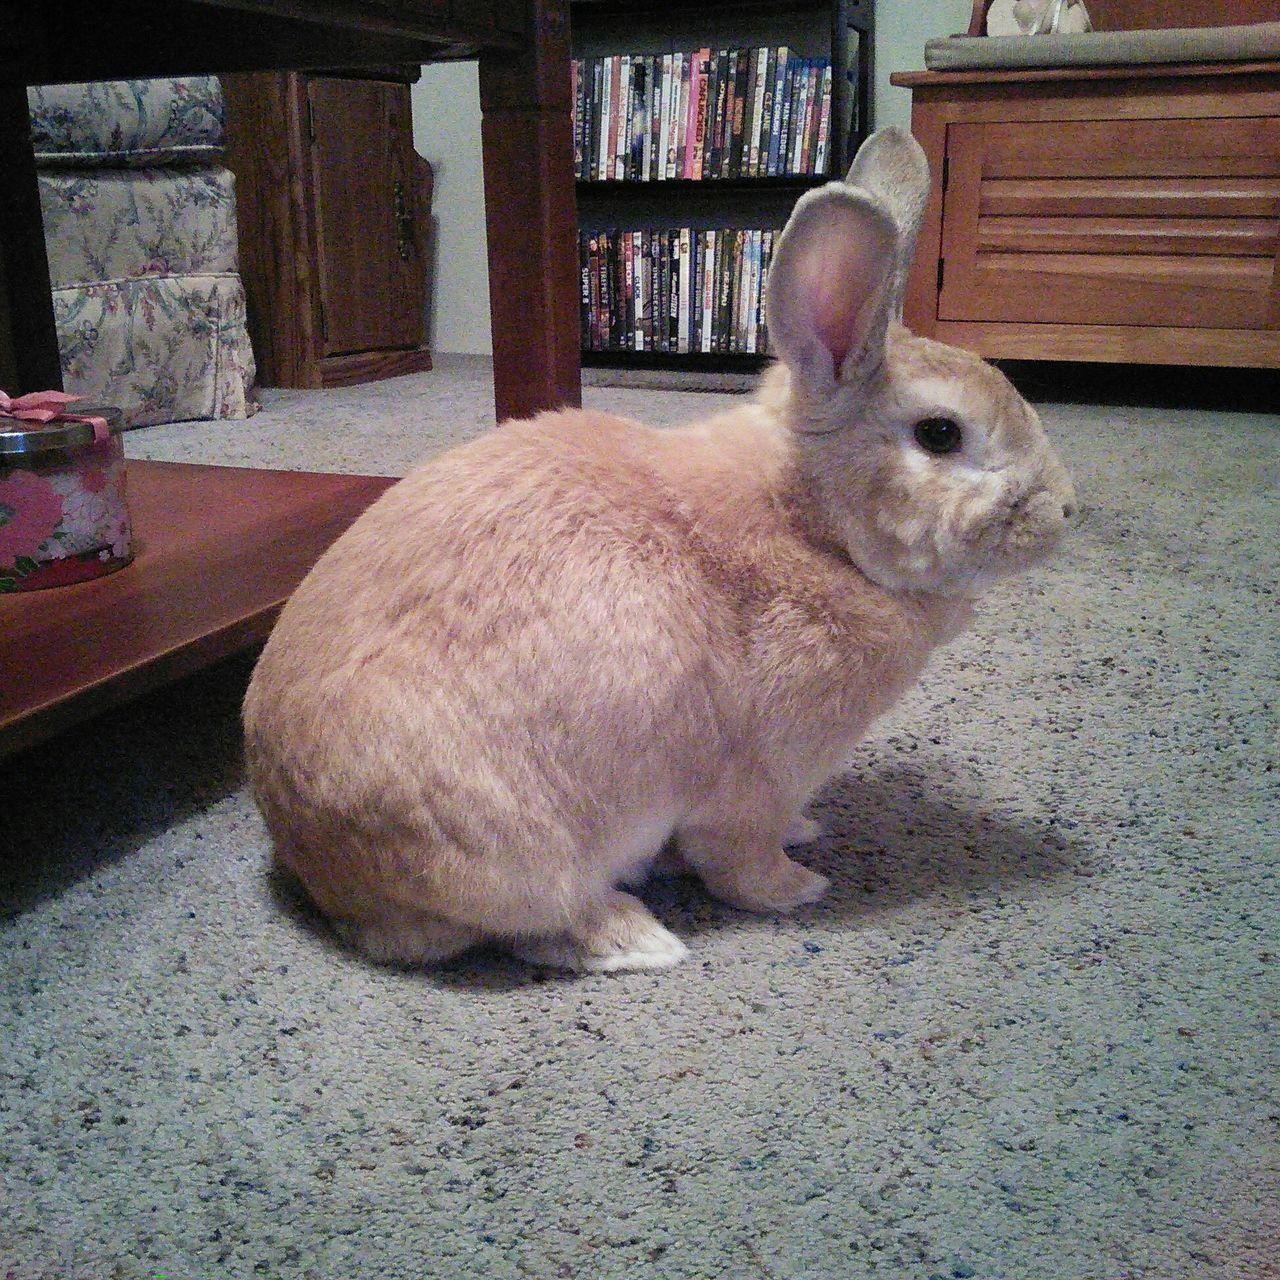 Rabbits 🐇 Rabbit ❤️ Rabbit Rabbit 🐇 Bunny  Bunny! Bunnys